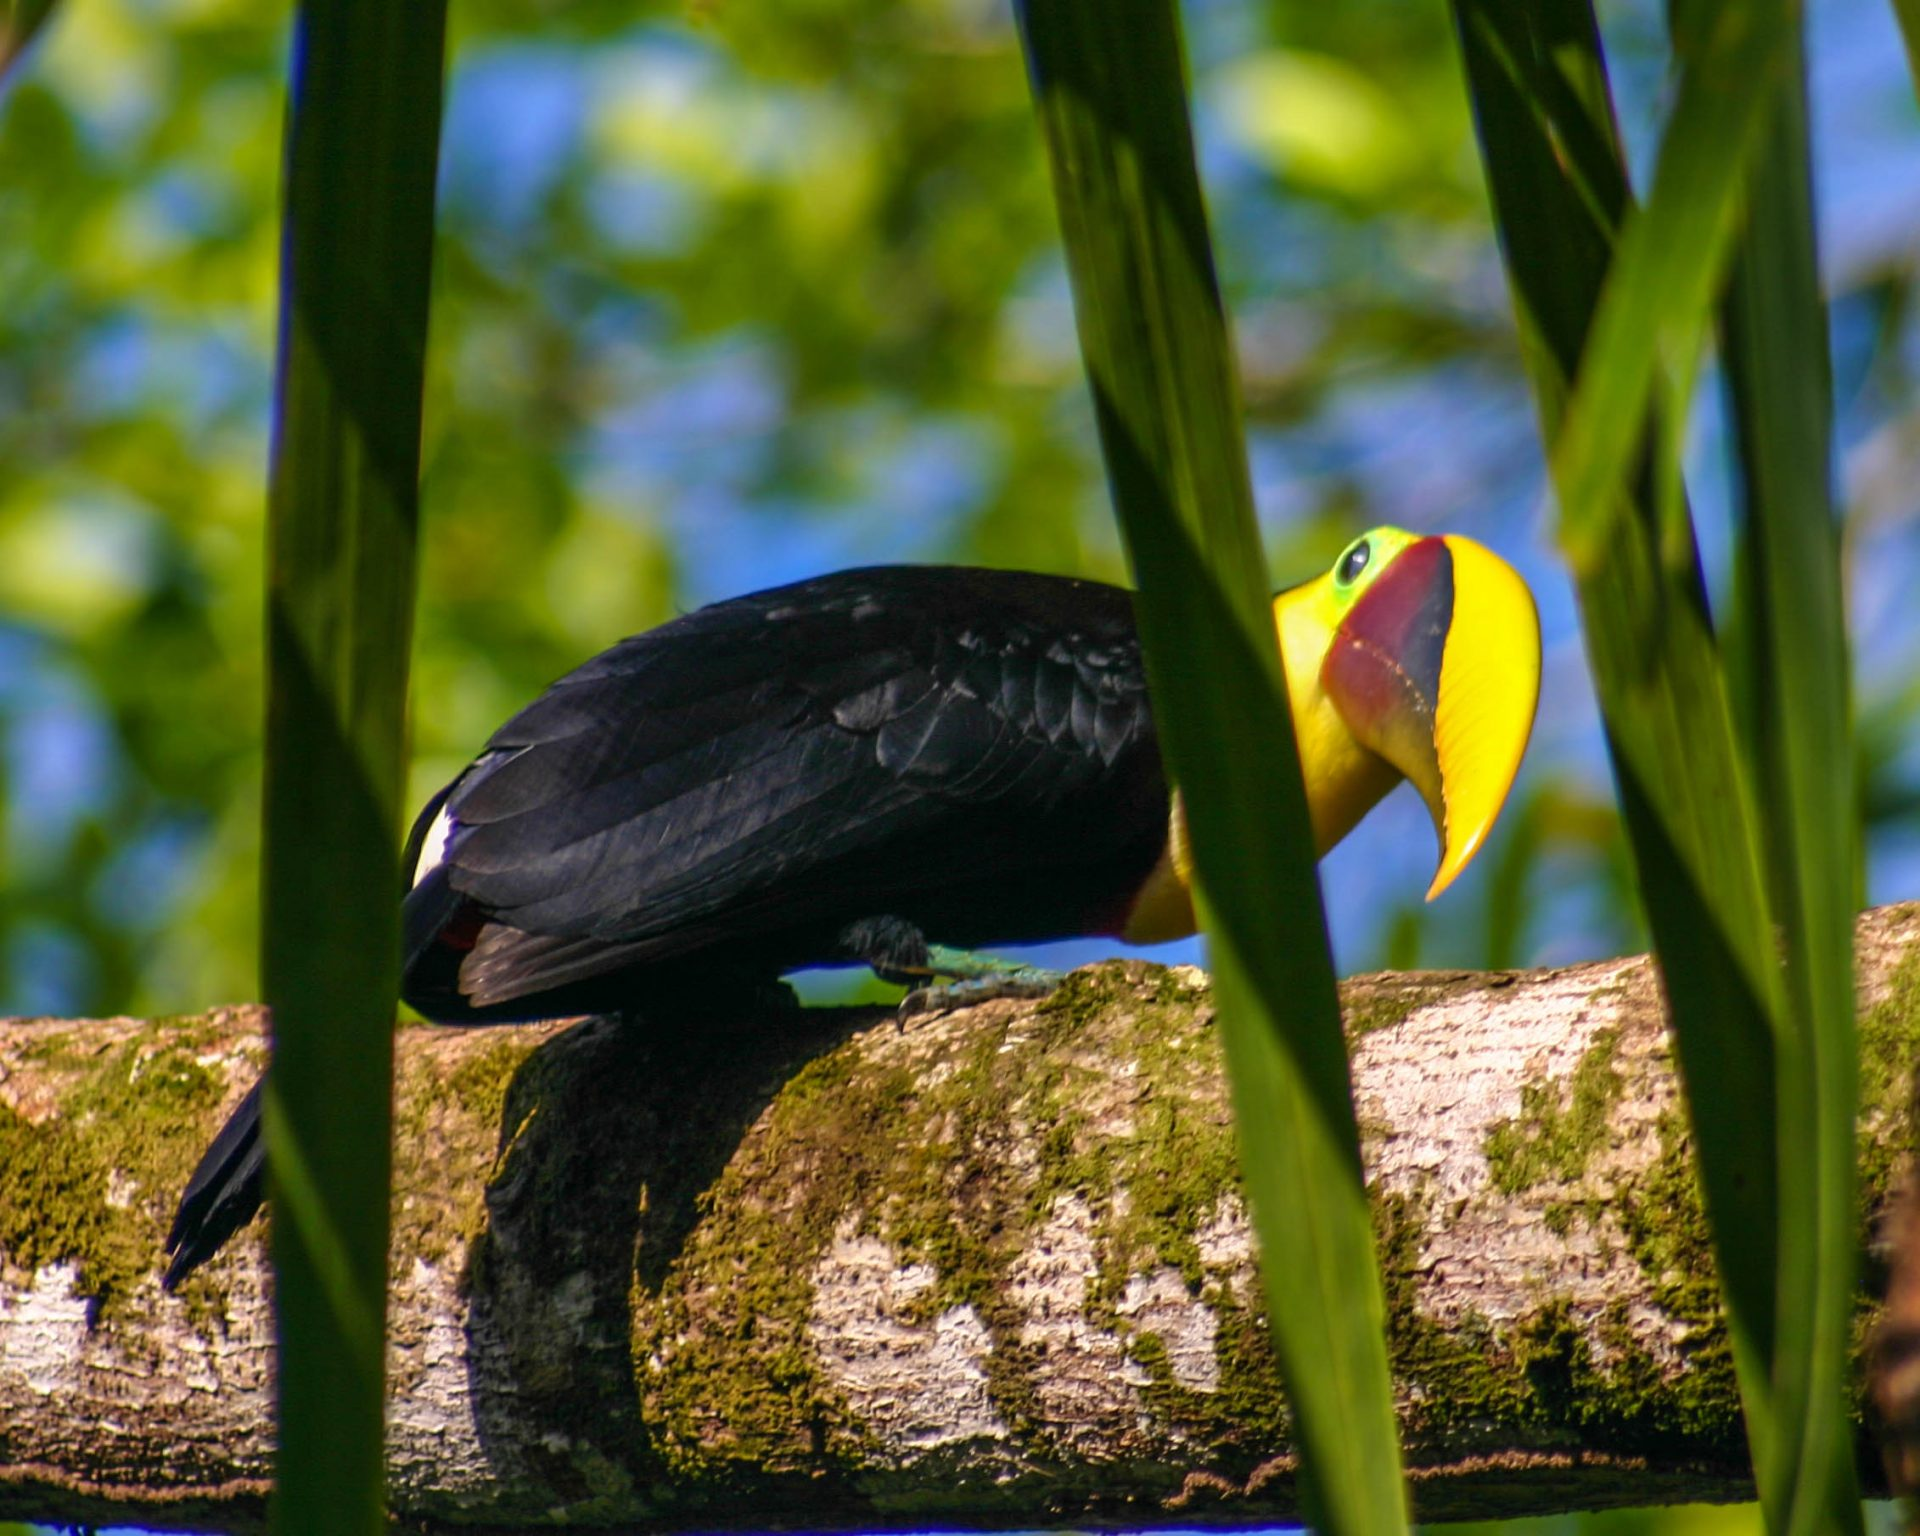 Bright beaked Toucan looks towards the camera - Osa Peninsula